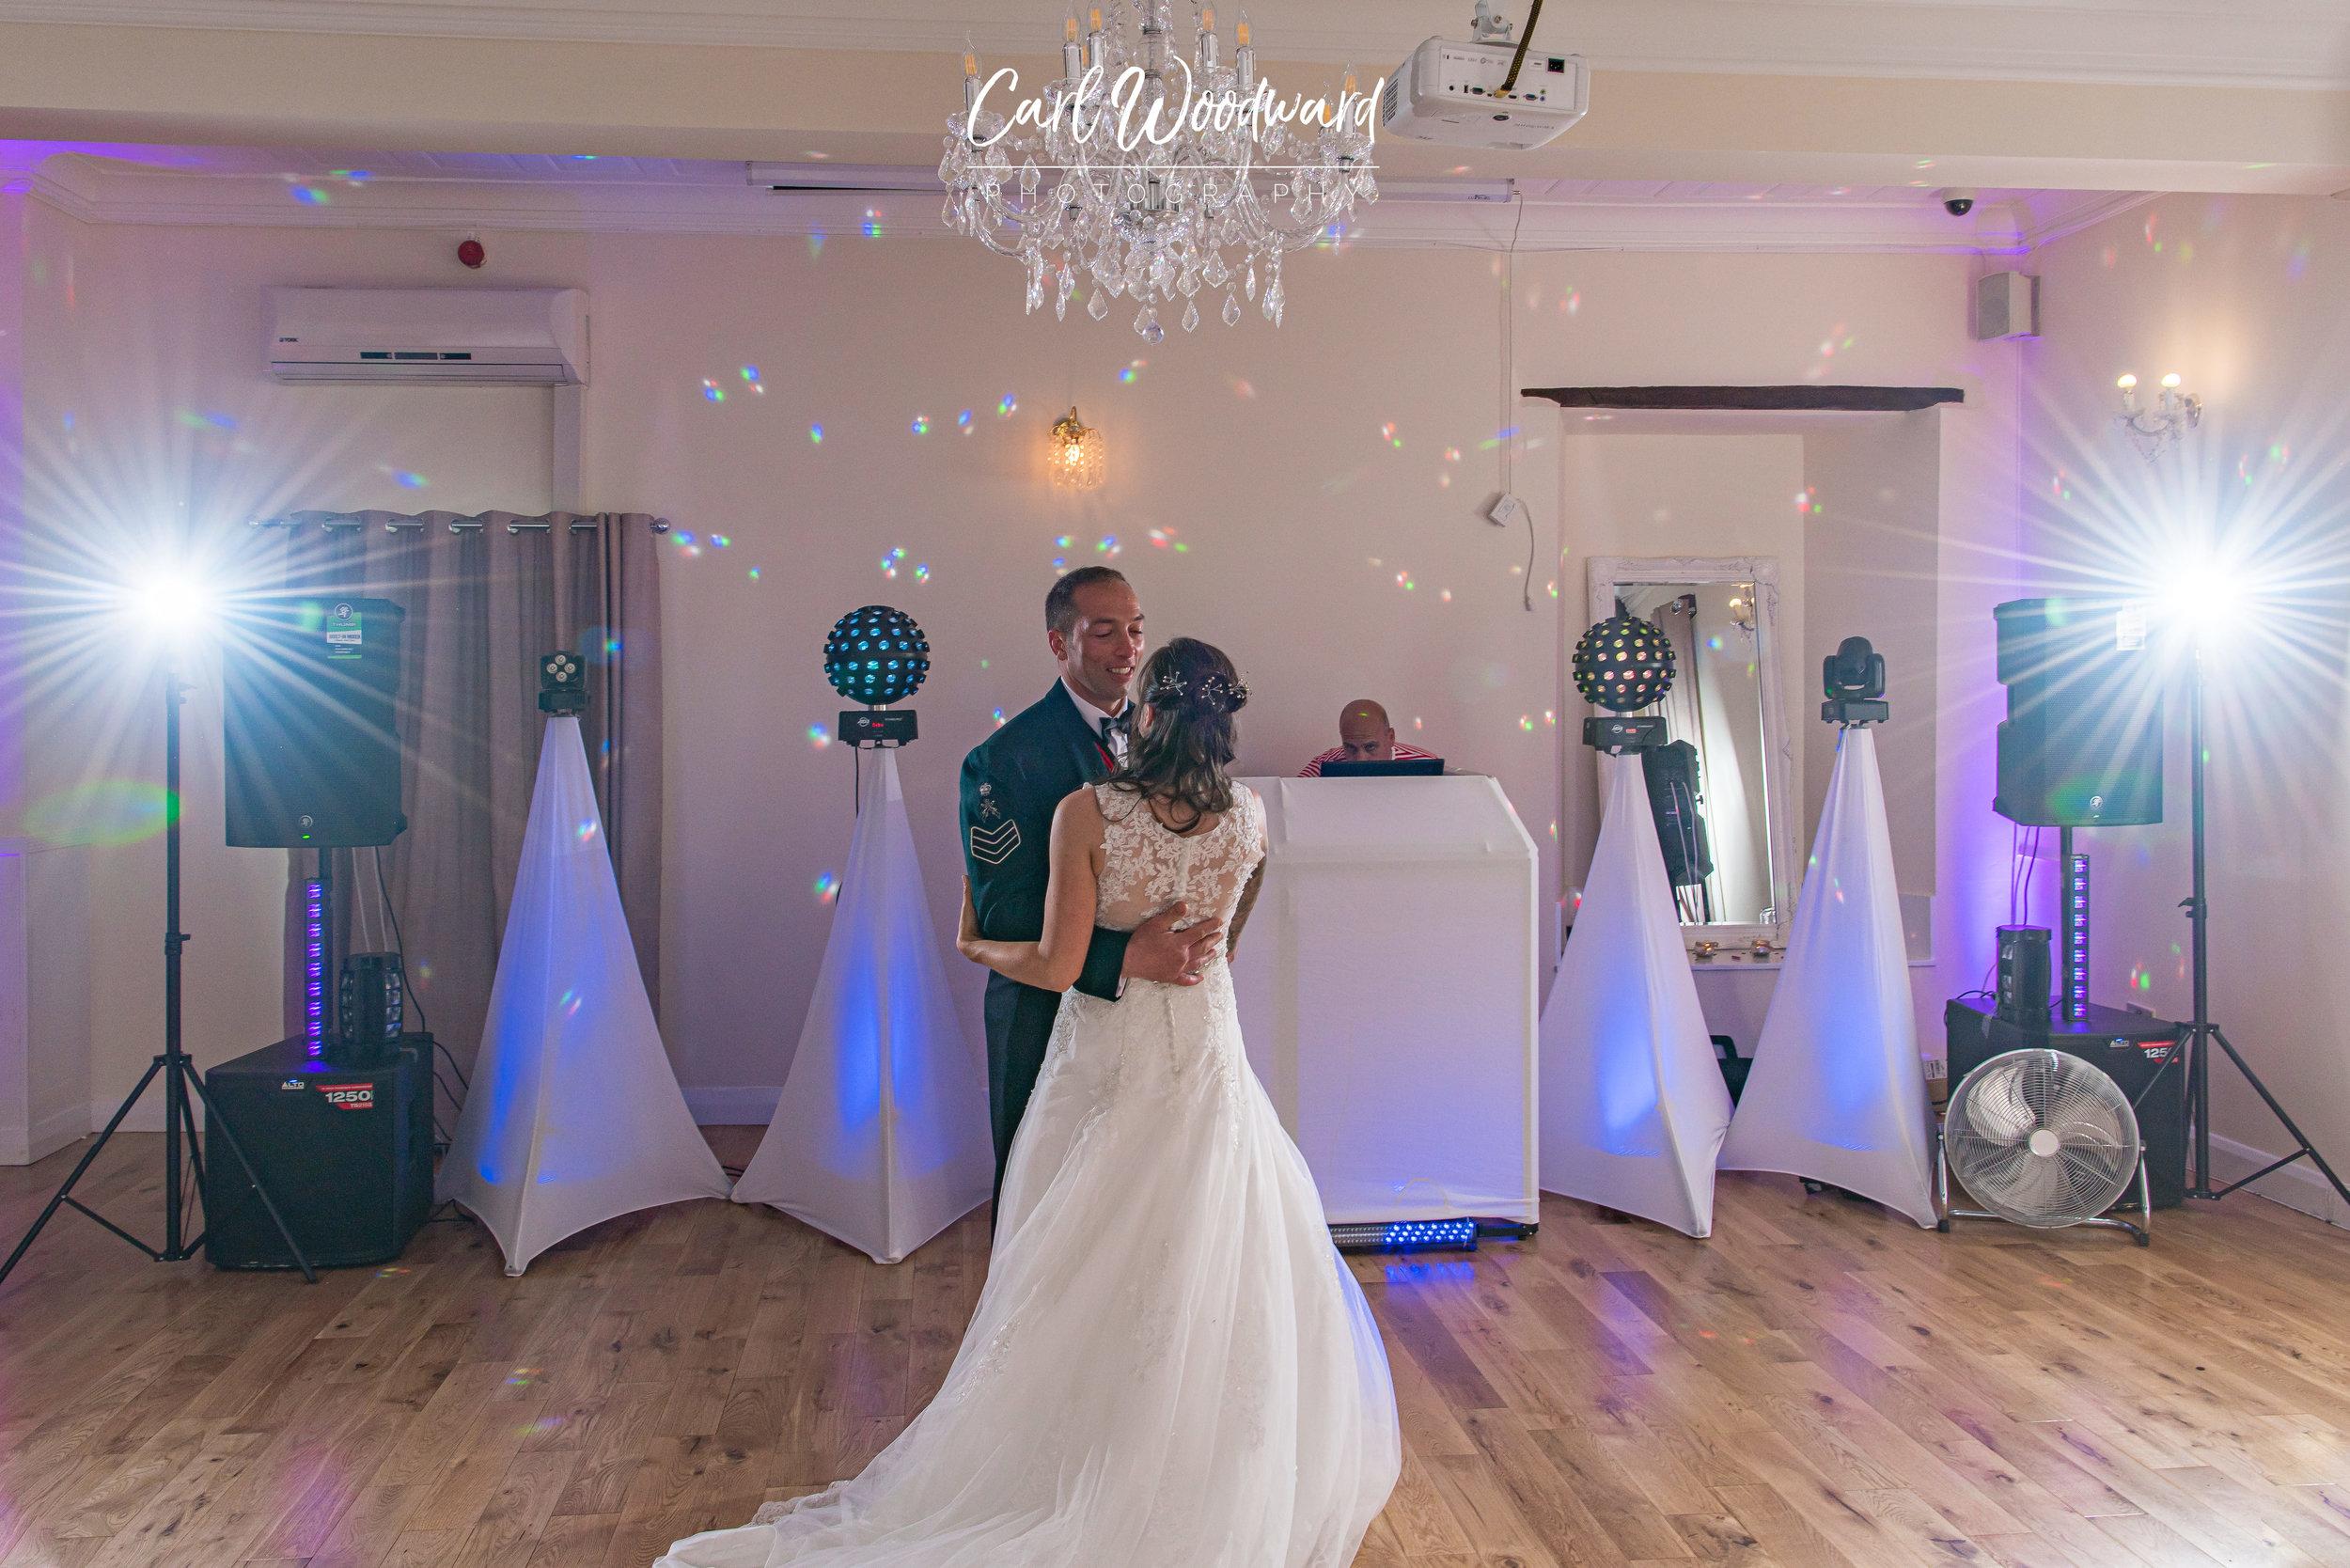 014-The-Old-Rectory-Hotel-Wedding-Photography-Cardiff-Wedding-Photography.jpg